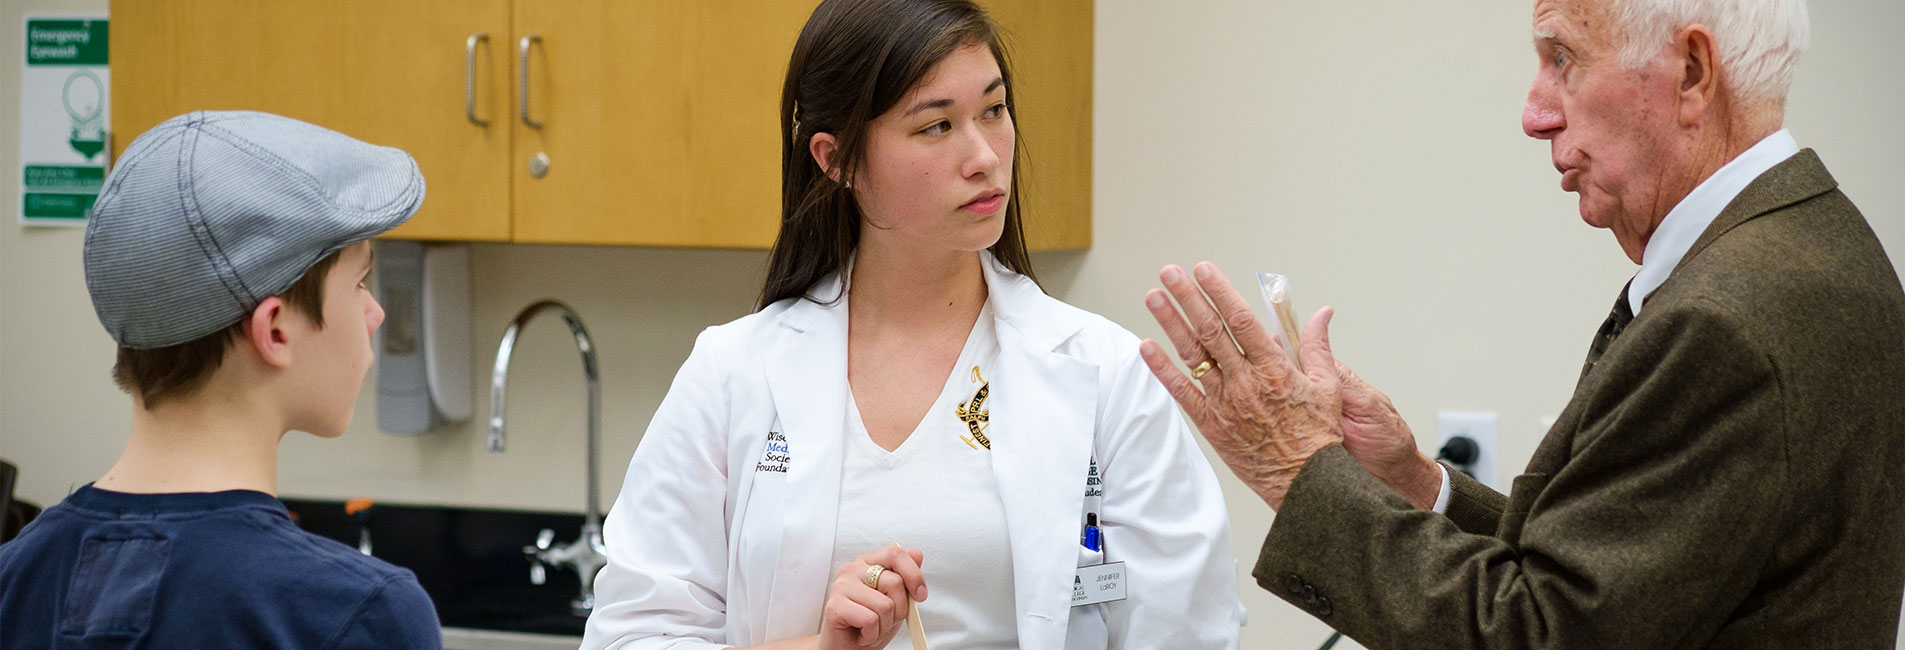 Medical College of Wisconsin | Walzak Marketing Communications